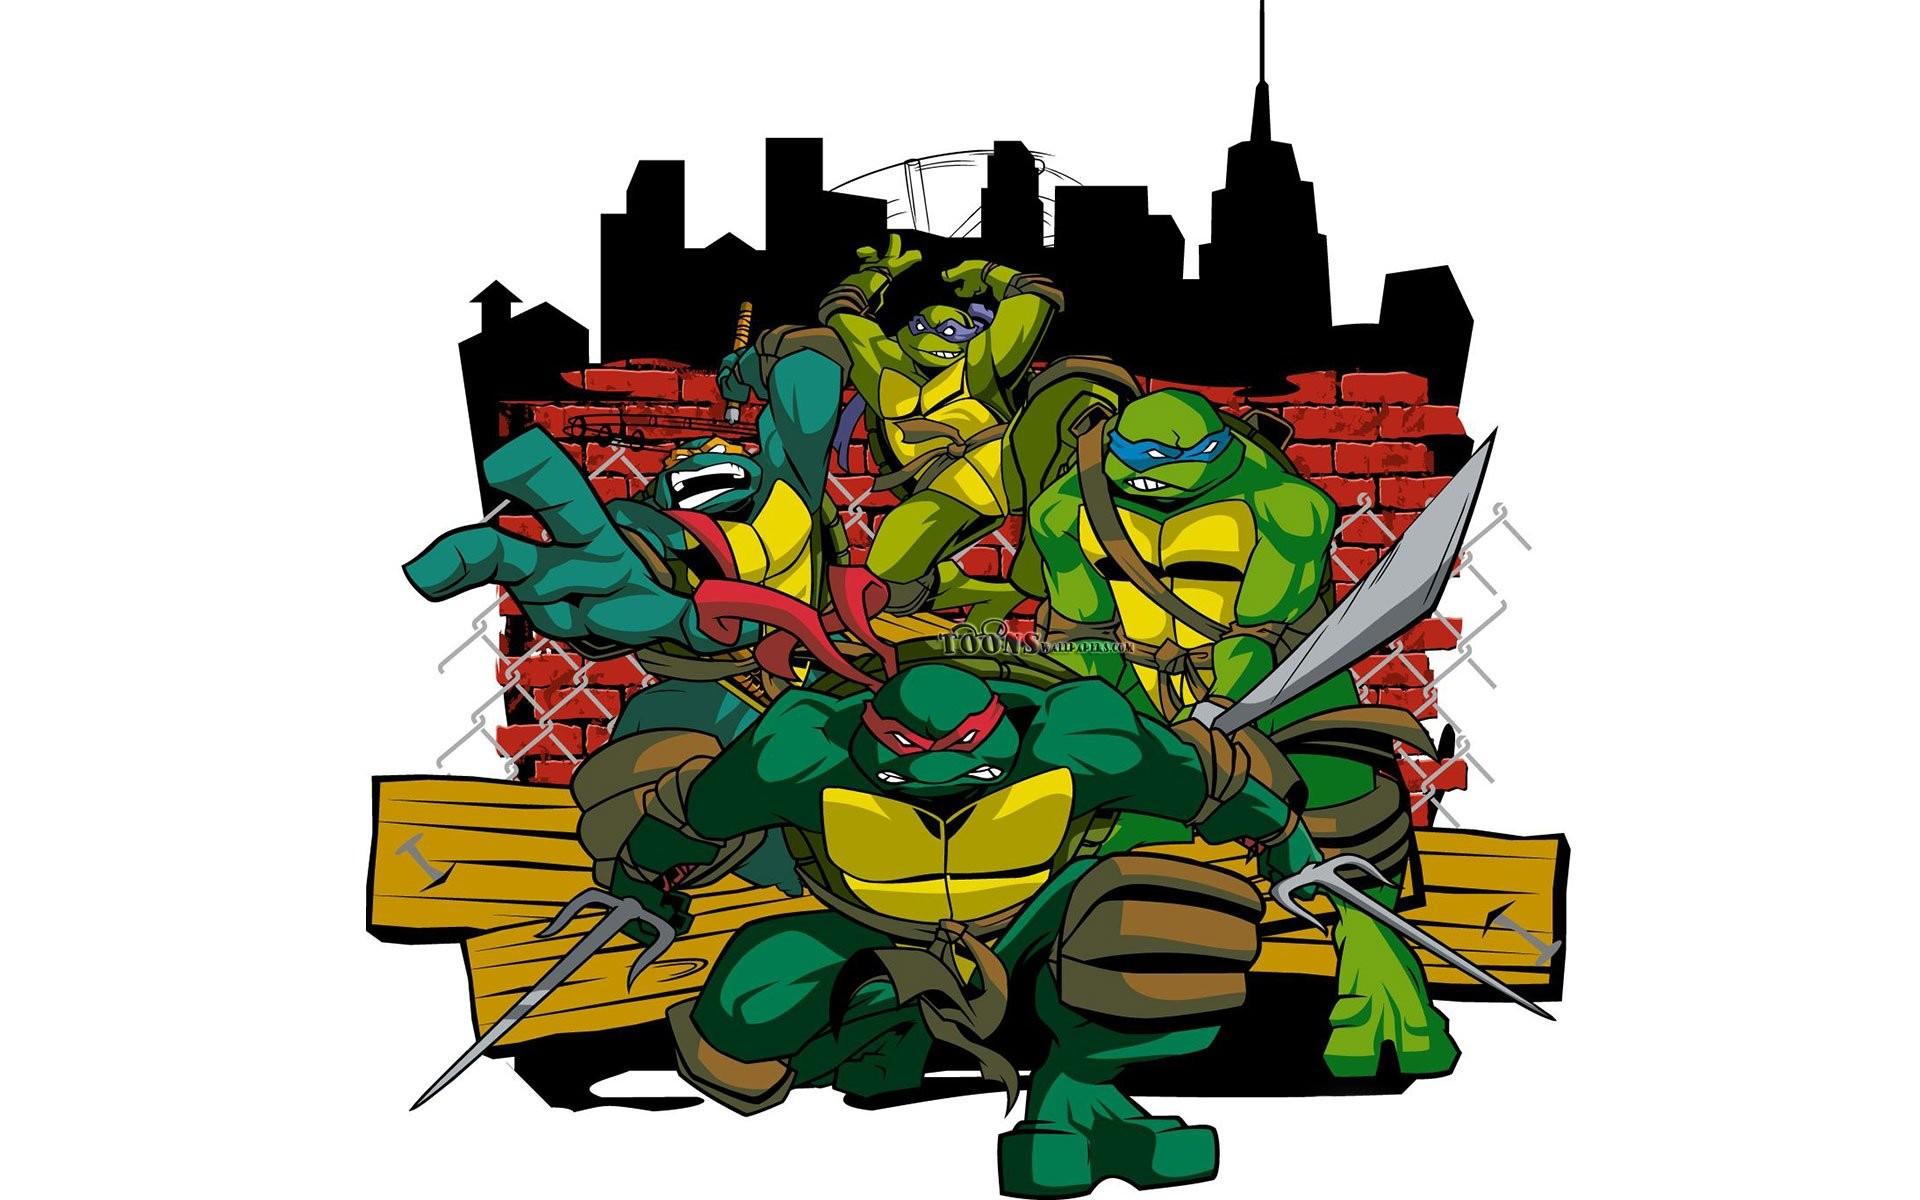 Desktop Ninja Turtles HD Wallpapers Images Download.